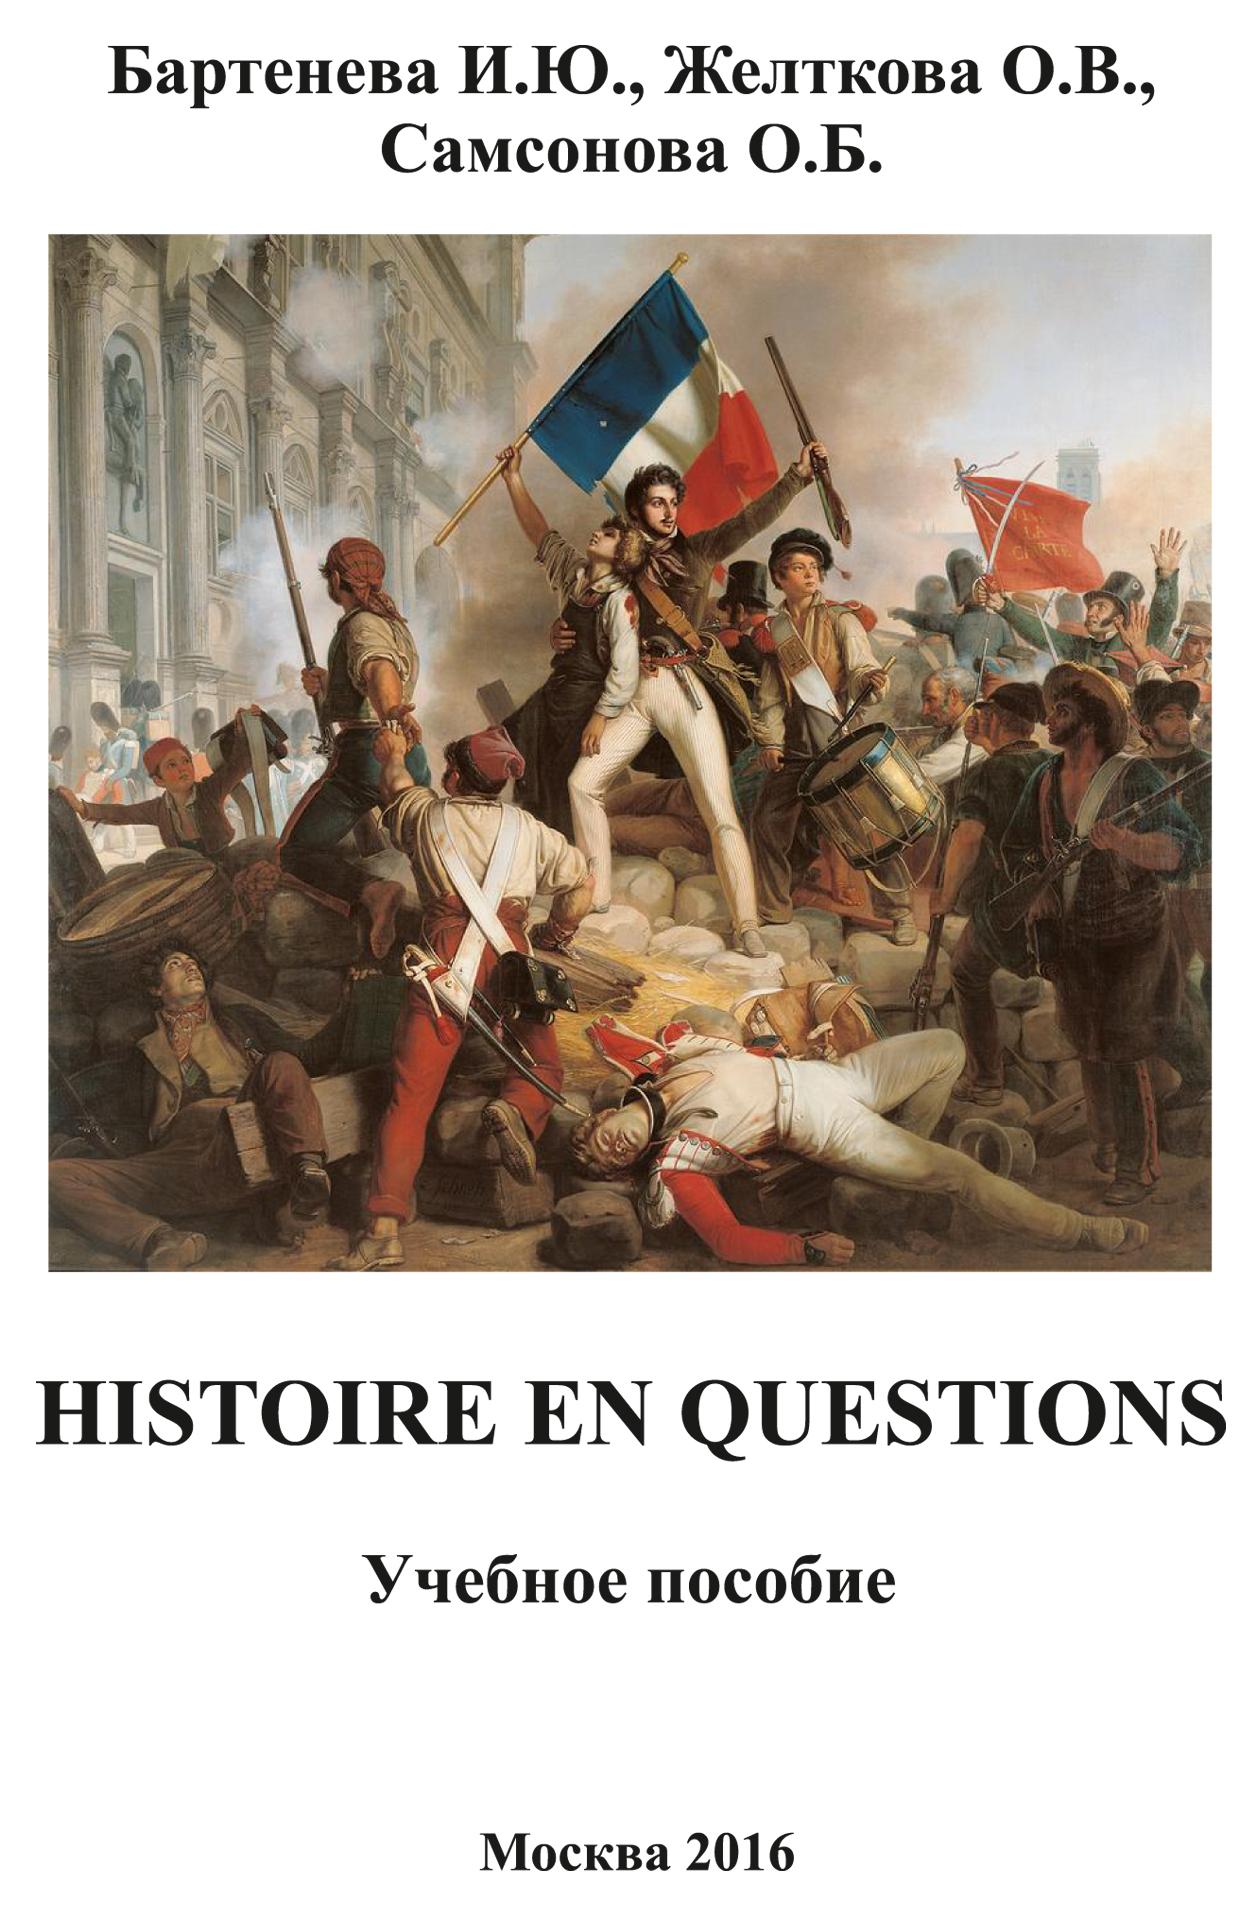 HISTOIRE EN QUESTIONS